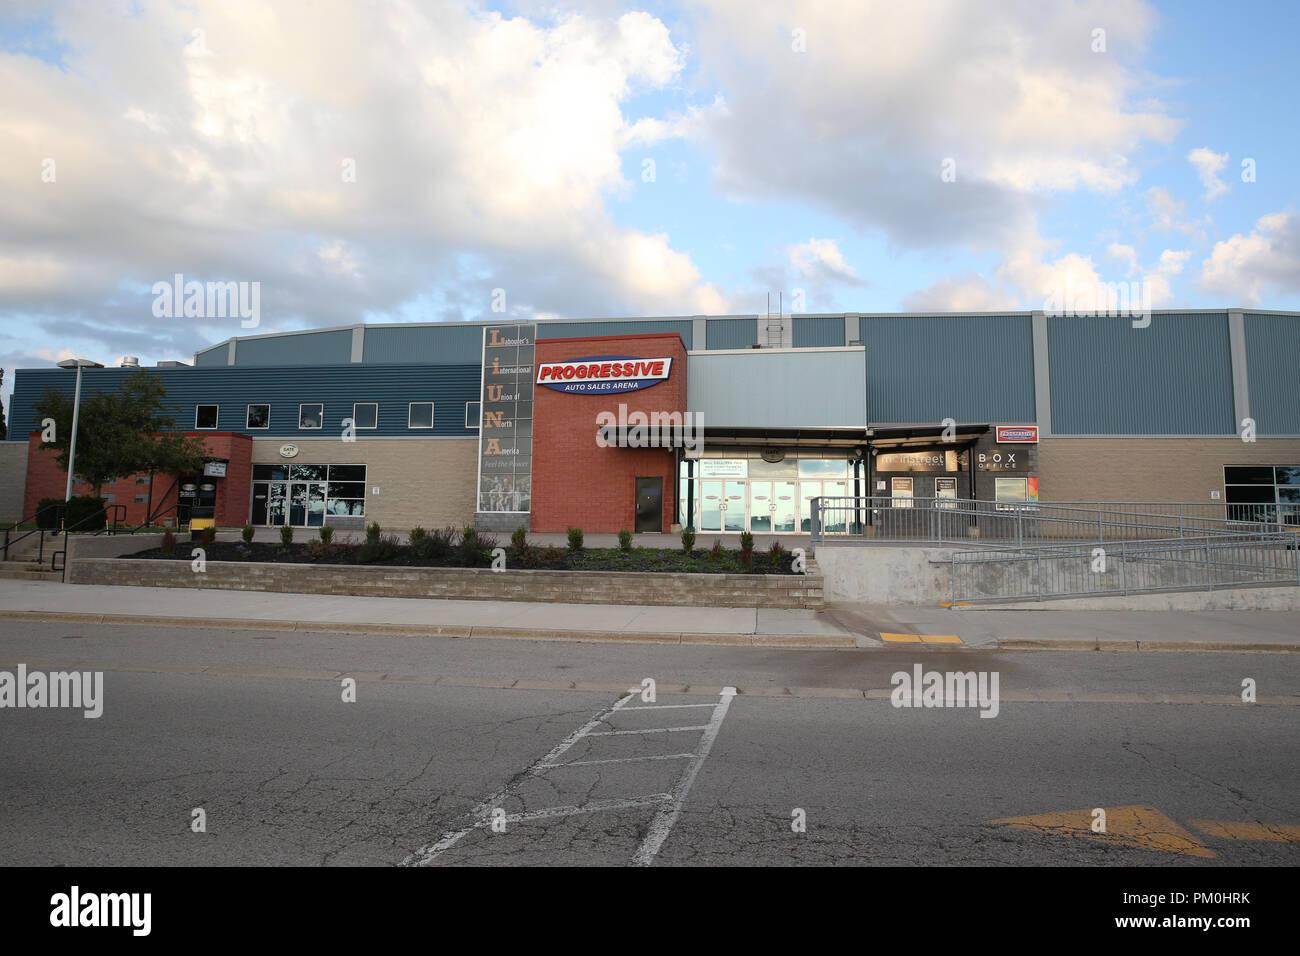 Sarnia Sting Arena -Progressive Auto Sales Arena - Lambton College - Stock Image